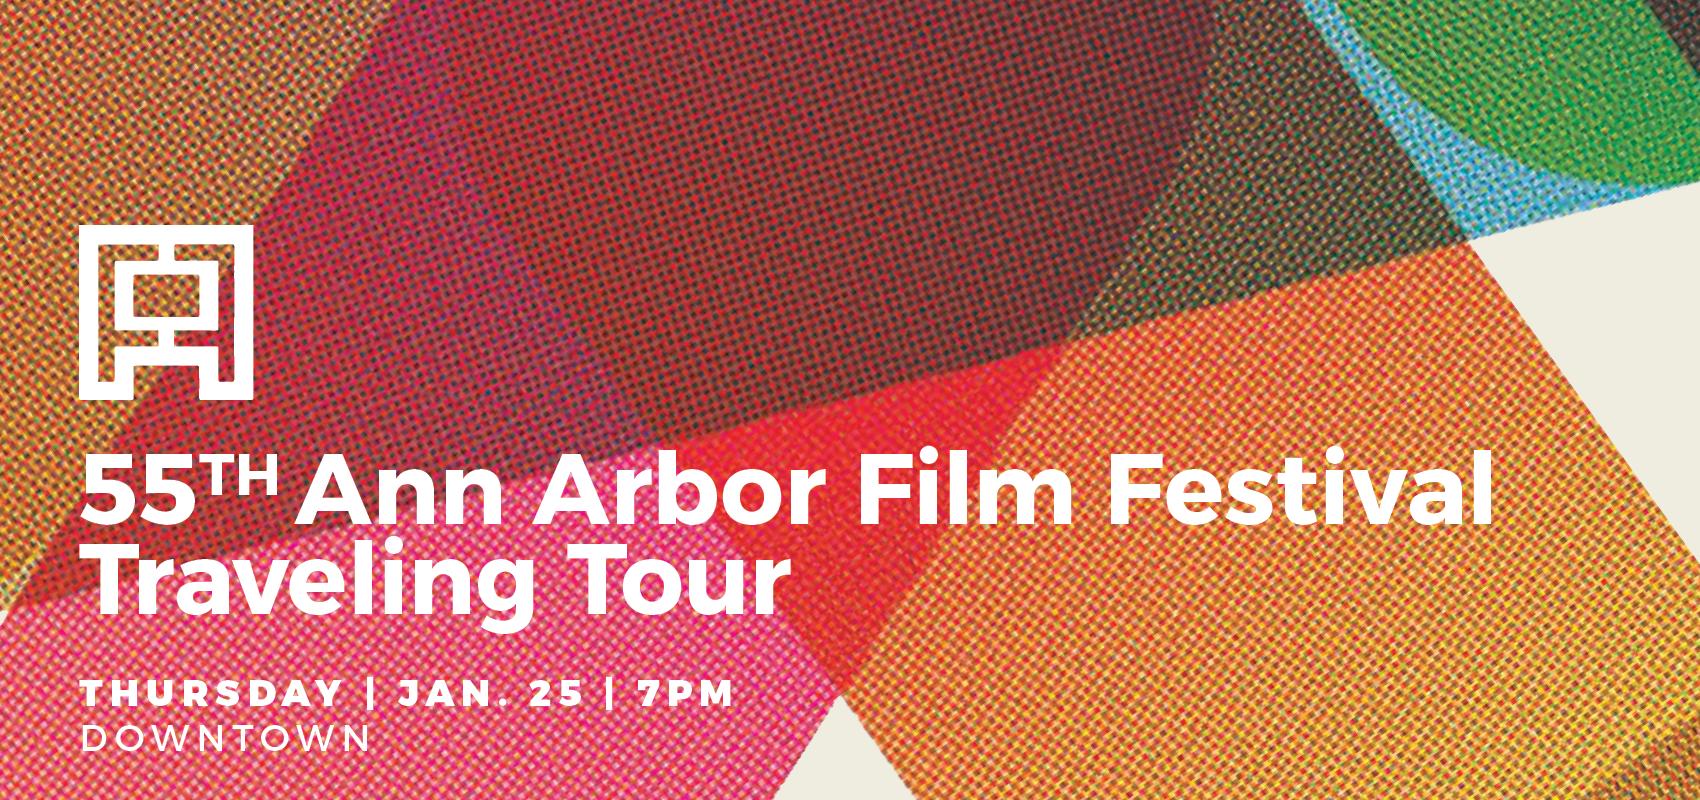 Ann Arbor Film Festival 55th Tour. Six experimental short films.